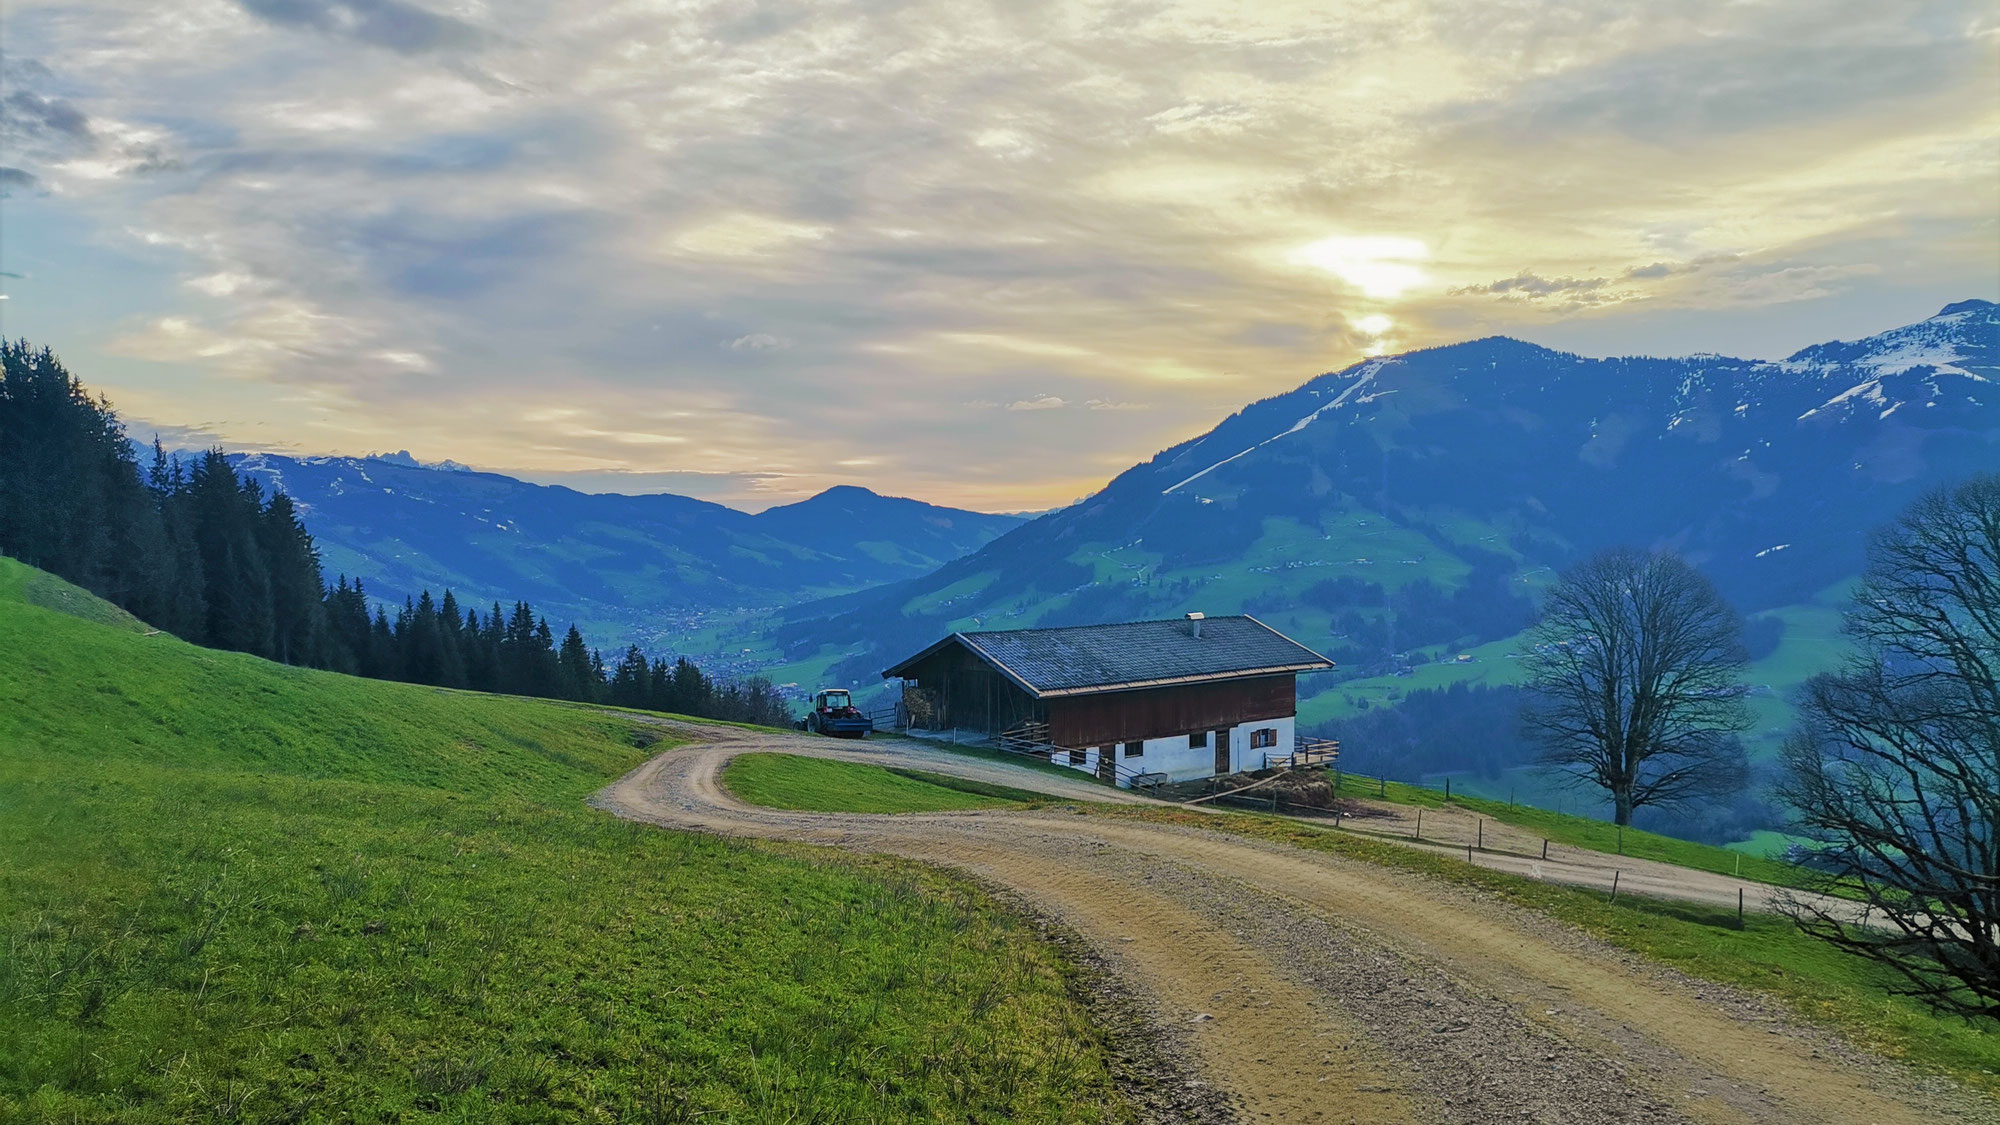 #812 Mountainbike-Tour Glanterer Kogel